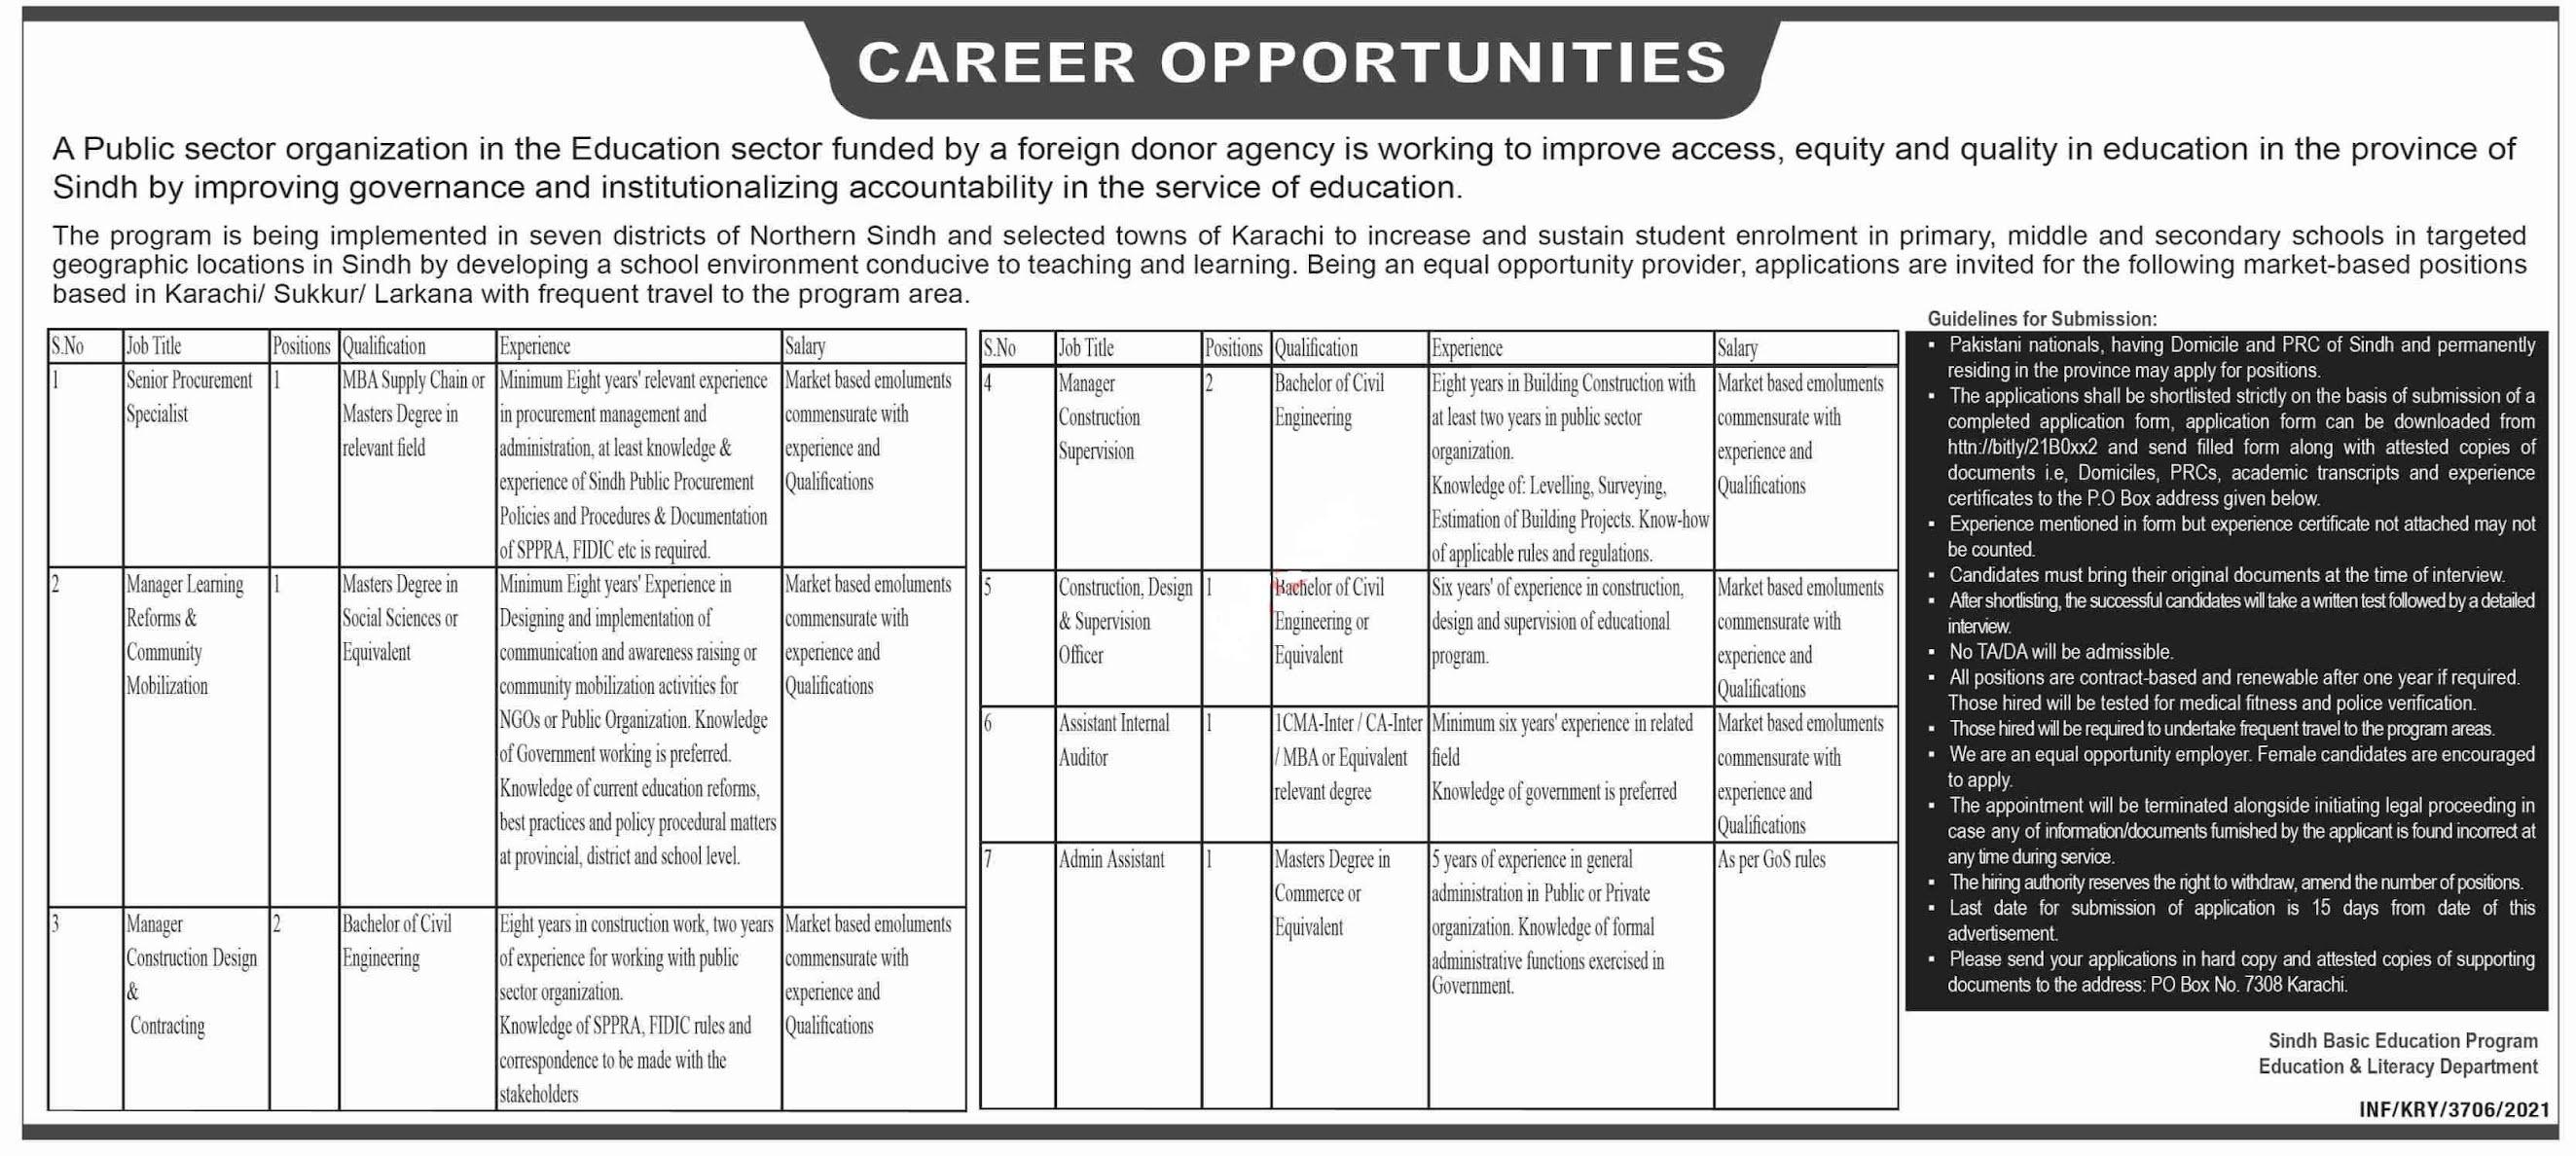 Education and Literacy Department Sindh Basic Education Program SBEP Karachi Jobs 2021